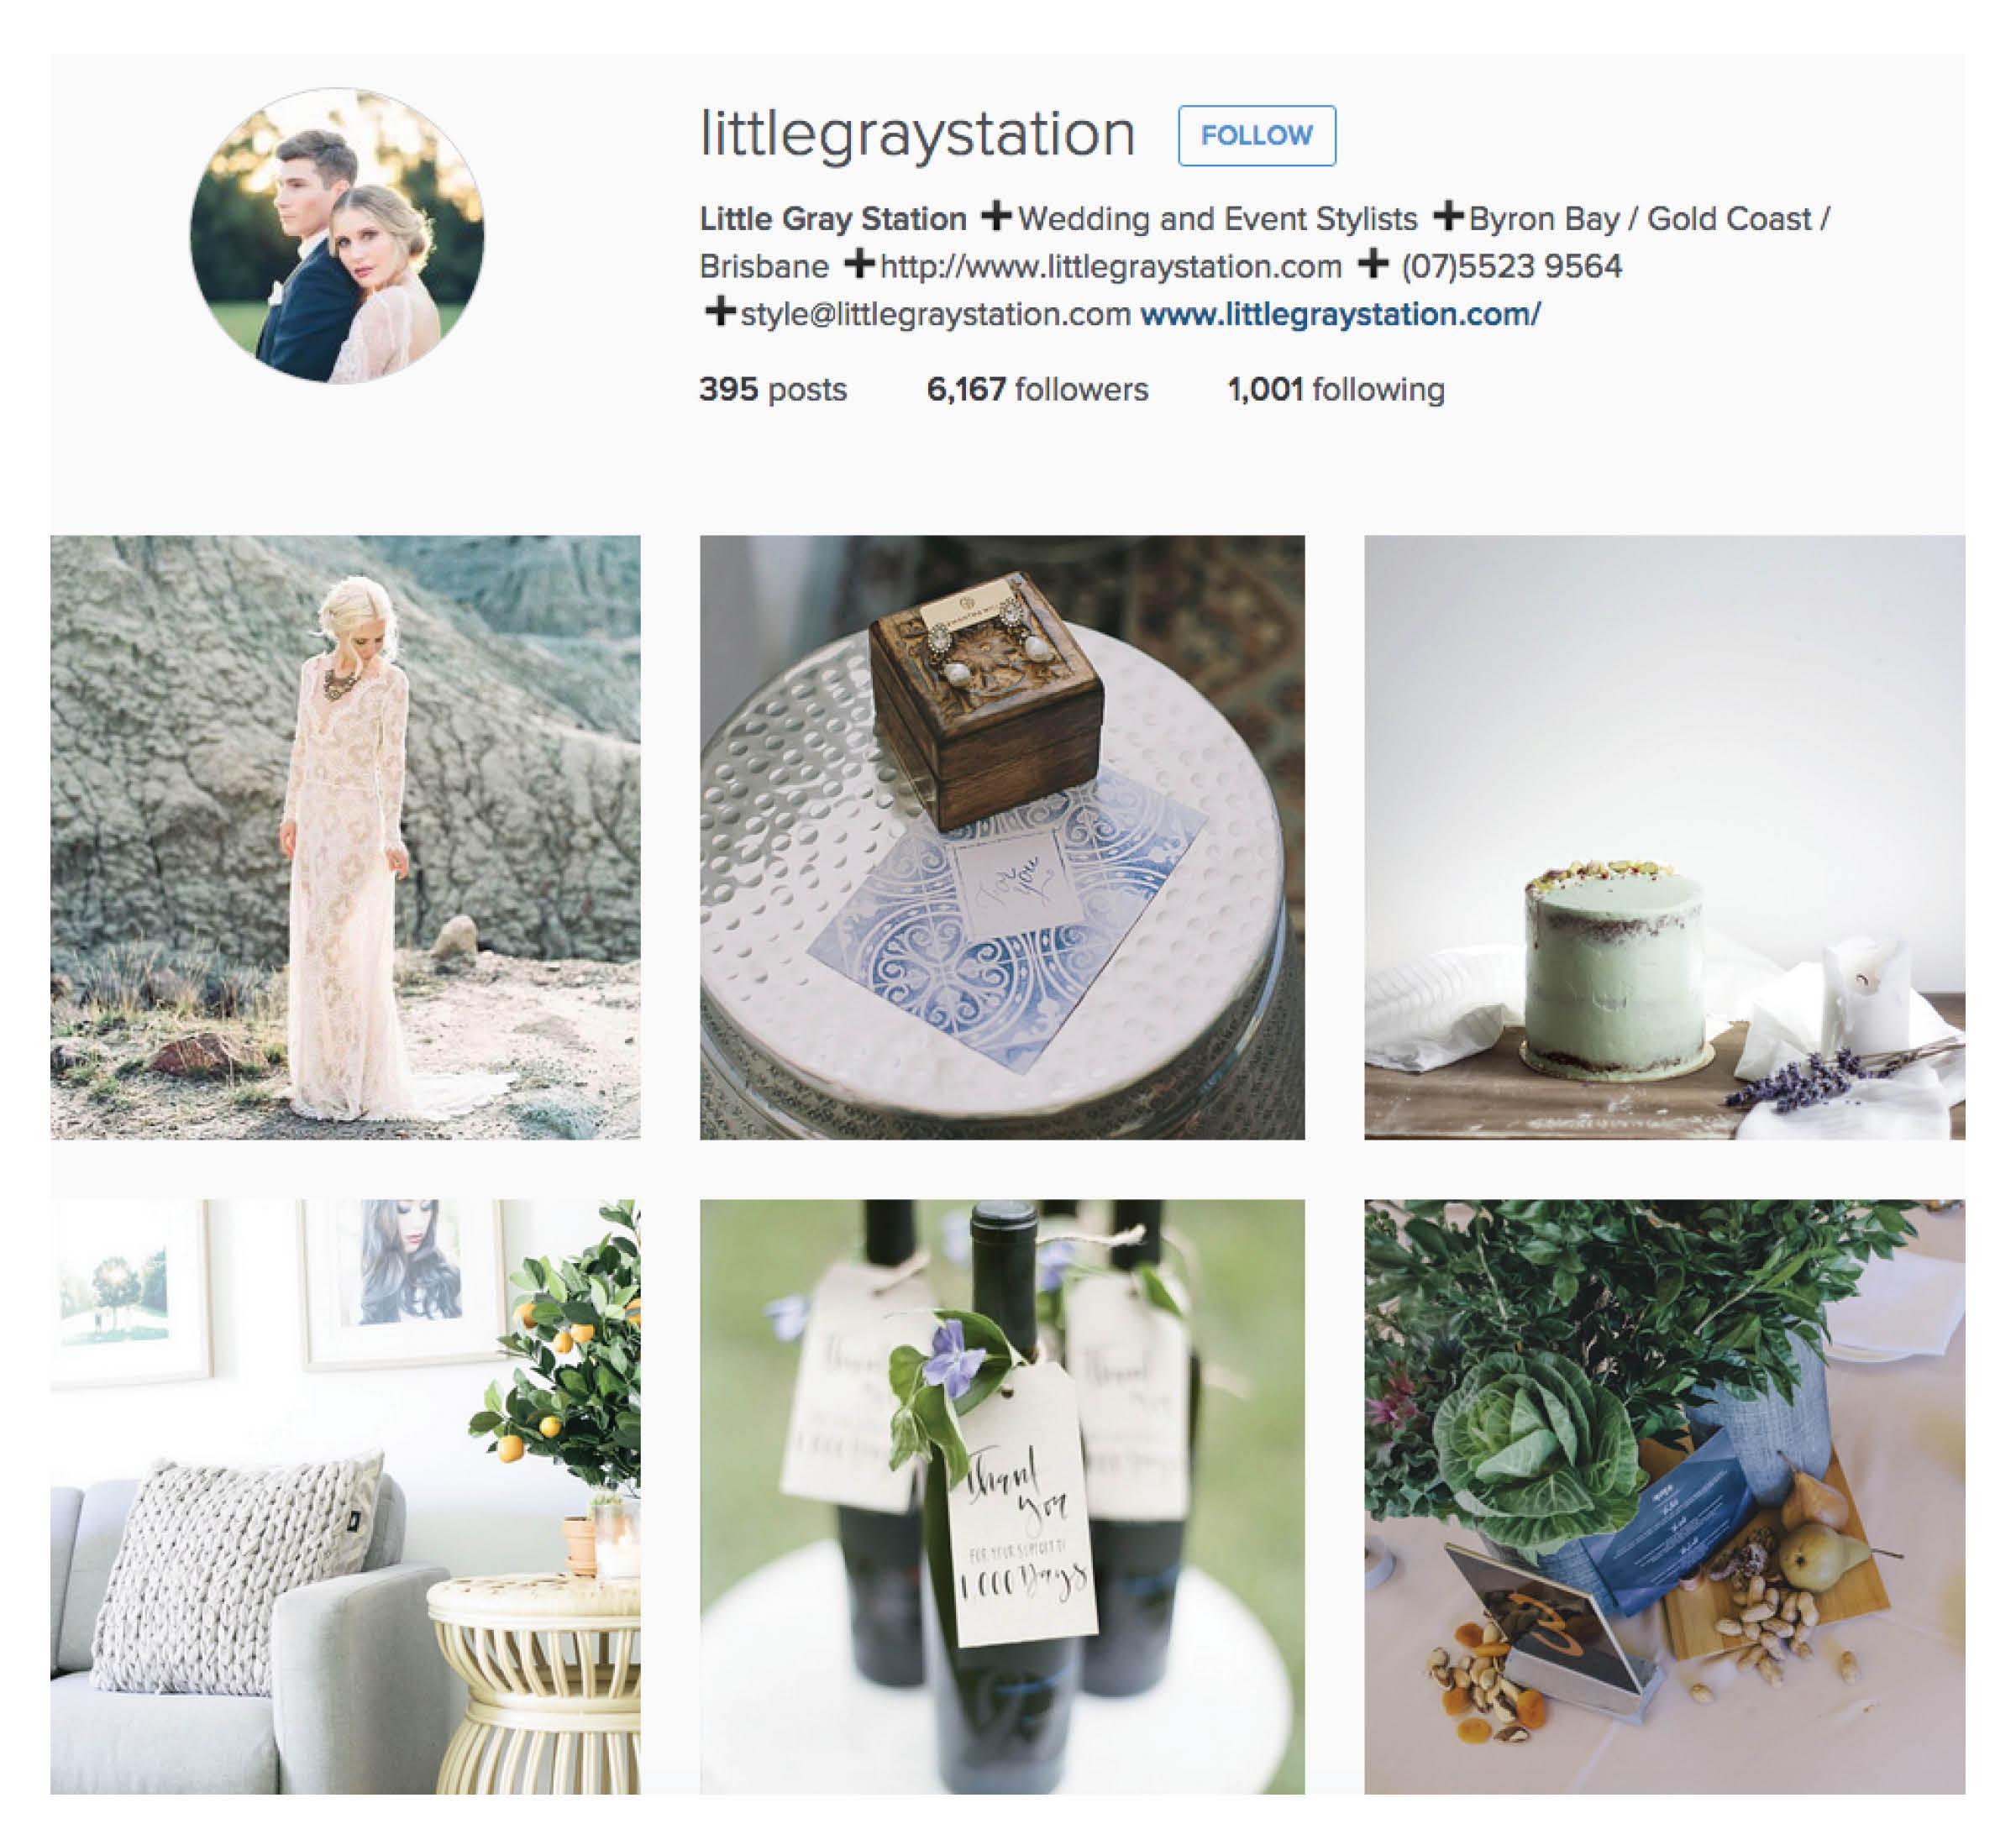 inspirational wedding instagram account